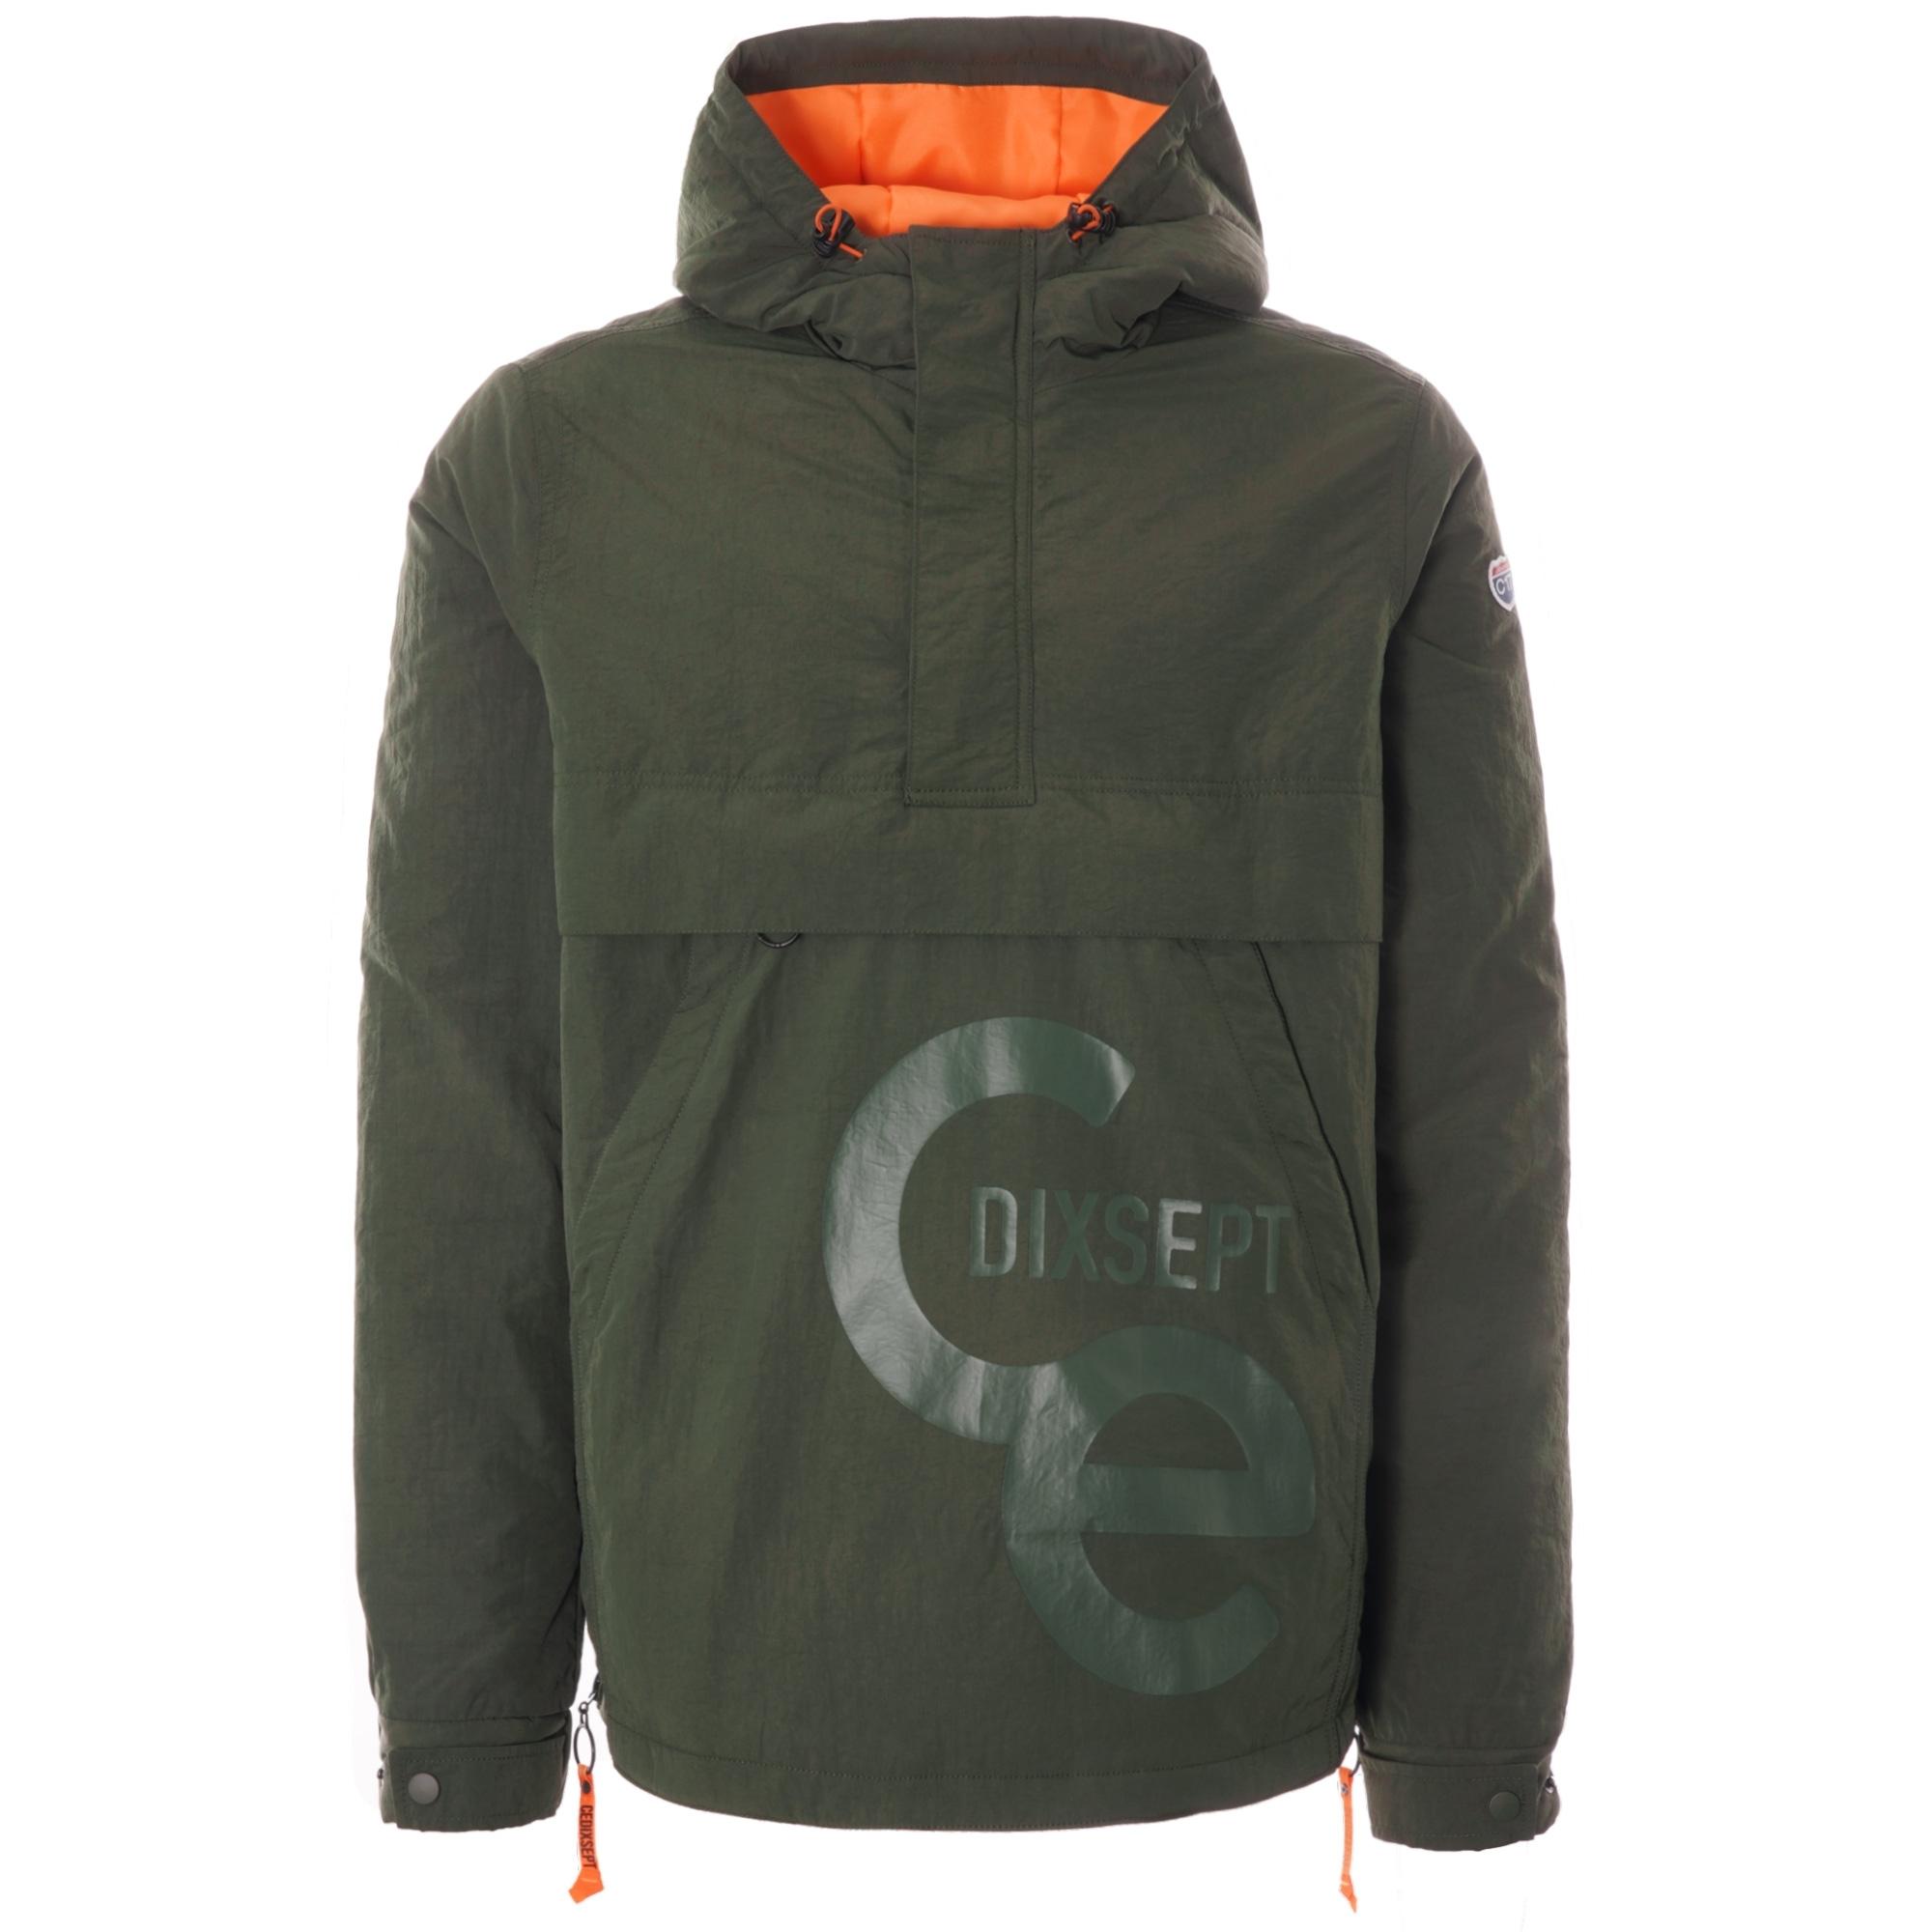 C17 Jeans jacket